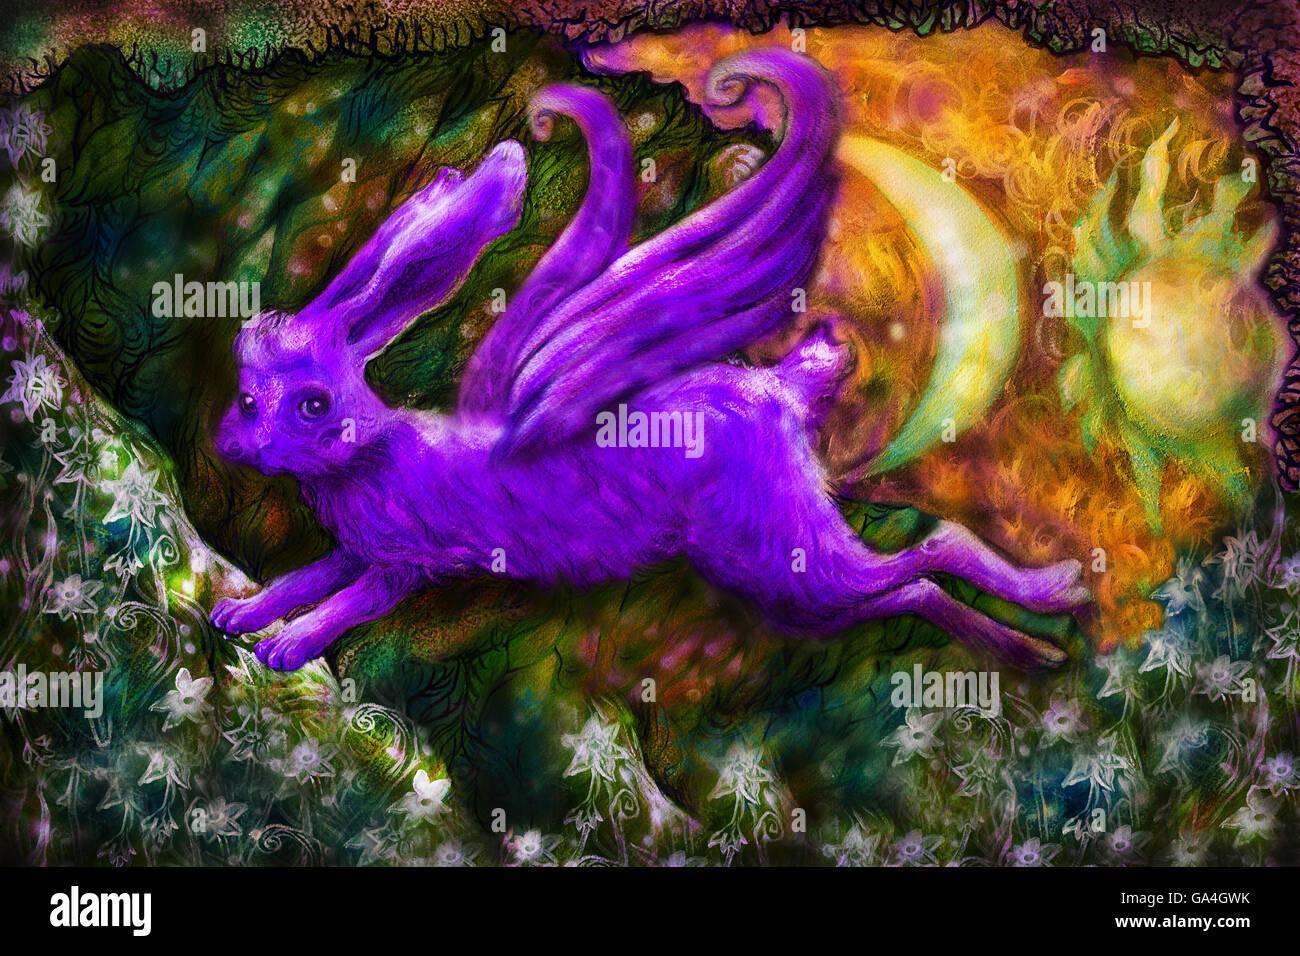 violett flying dreamy rabbit in fairy-tale land, illustration - Stock Image